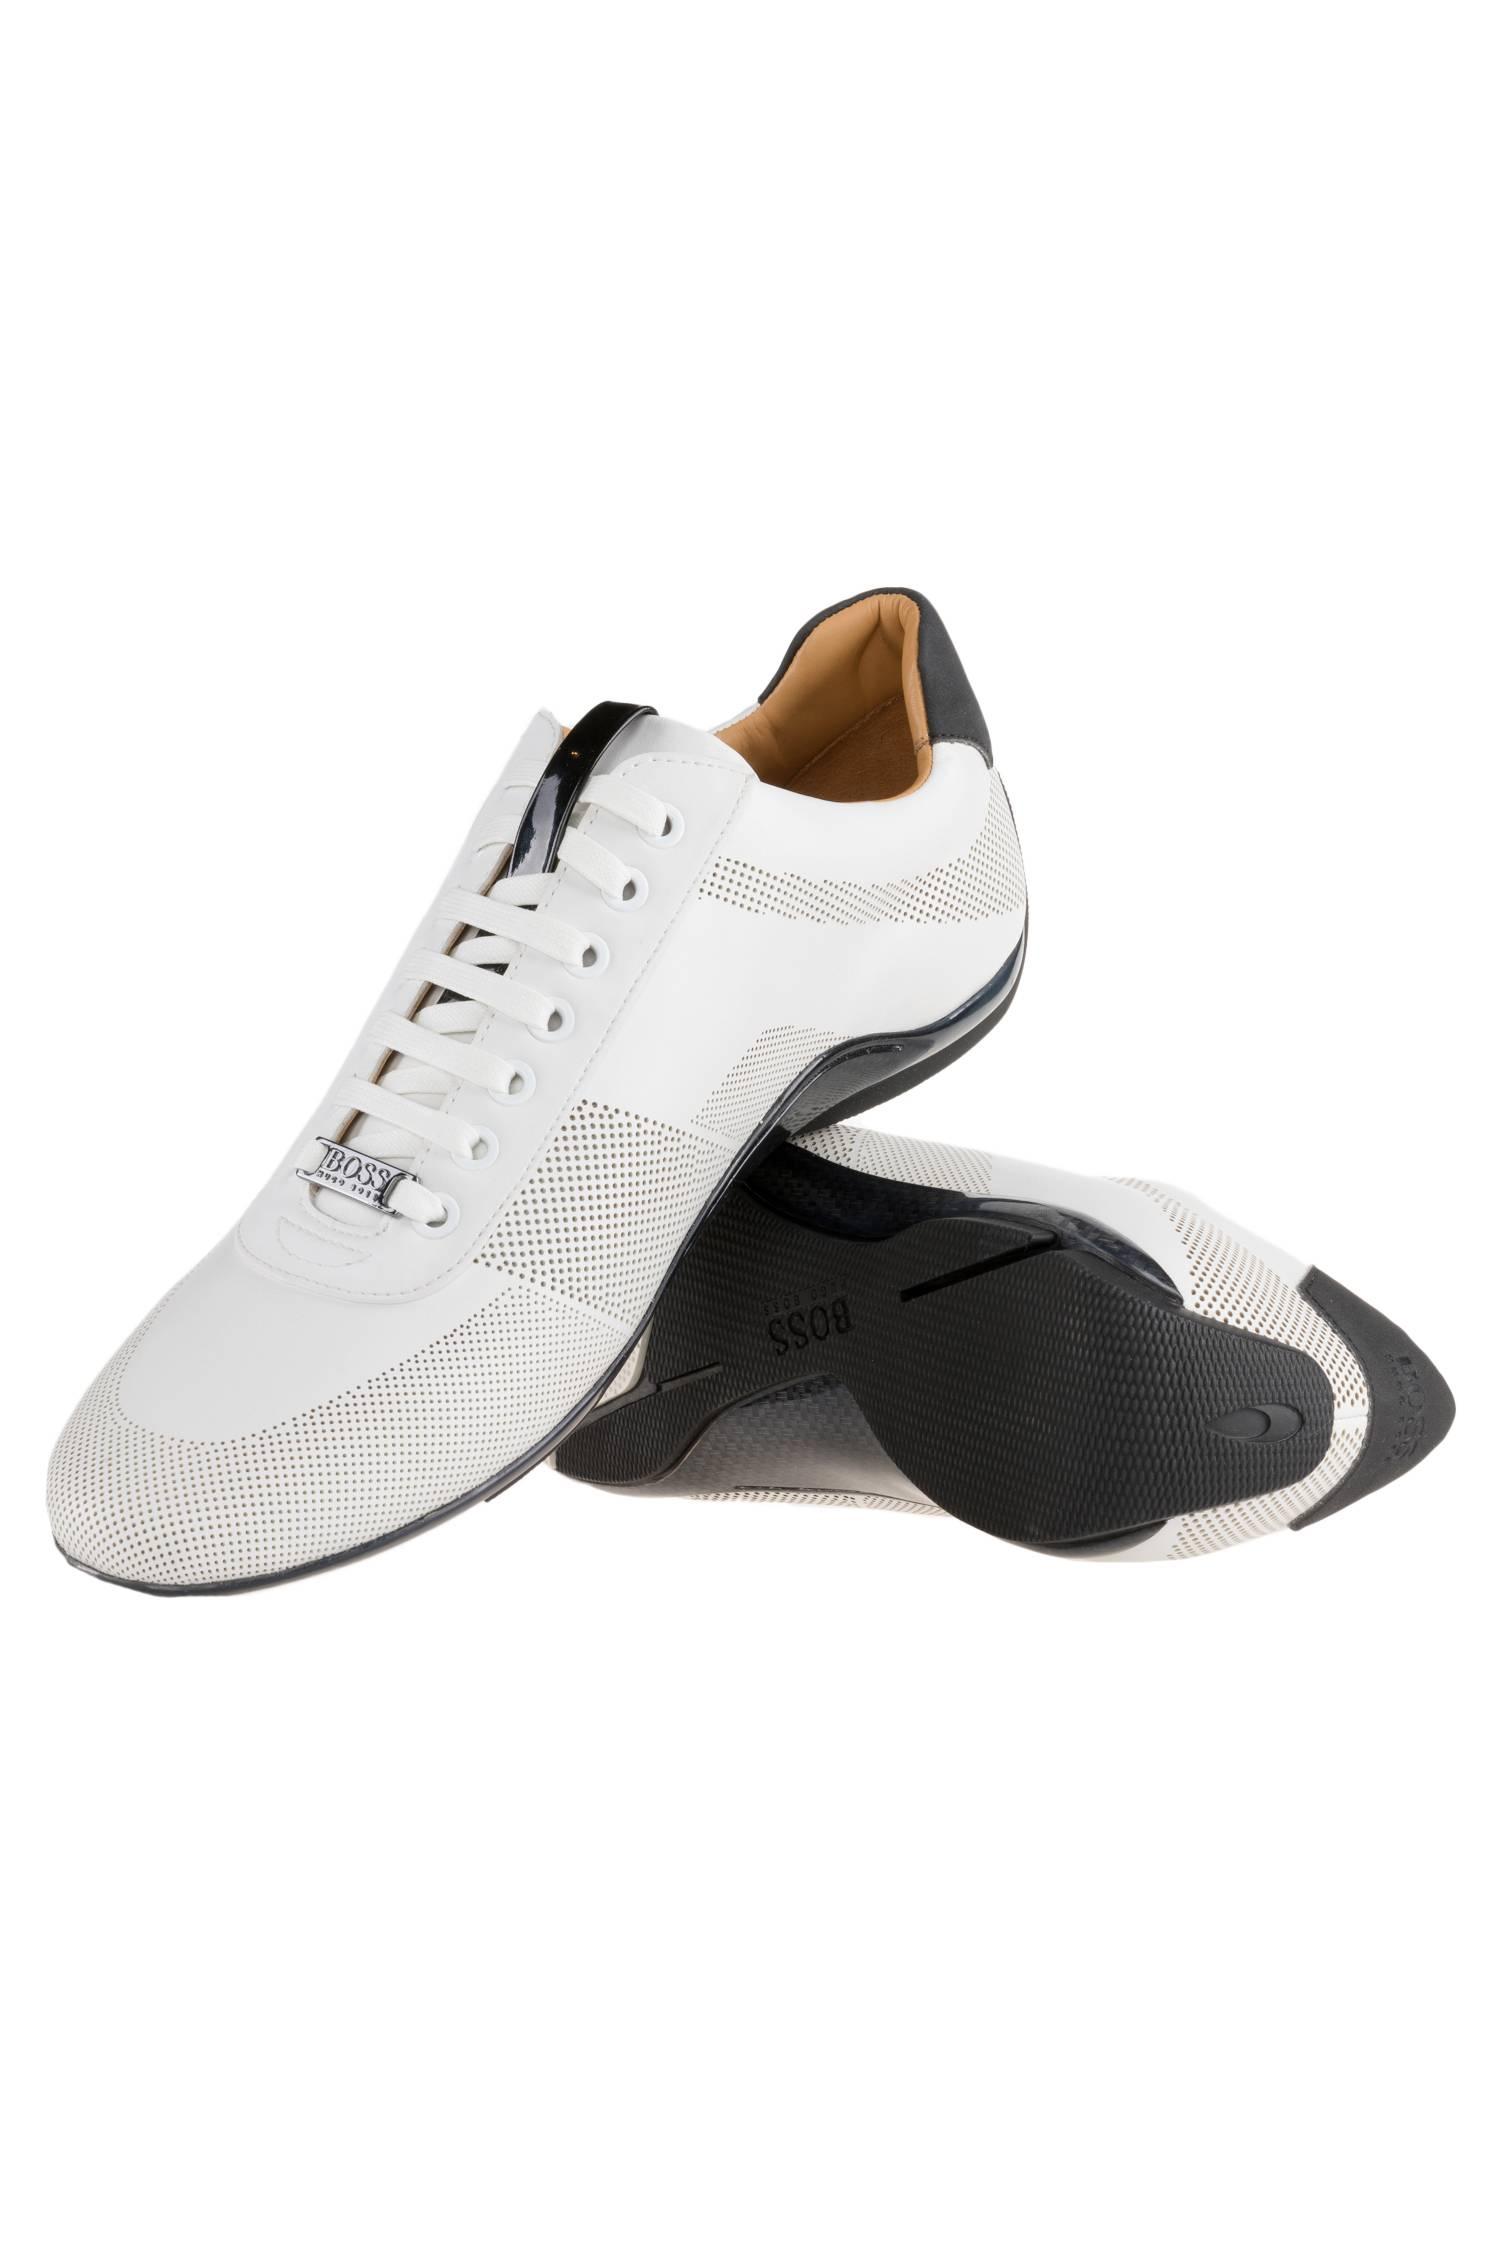 pretty nice 14d74 b7554 ... Mens Nike Zoom SPRDN 11 Metallic Silver Silver Silver Black Red White  Running Shoes 876267- ...